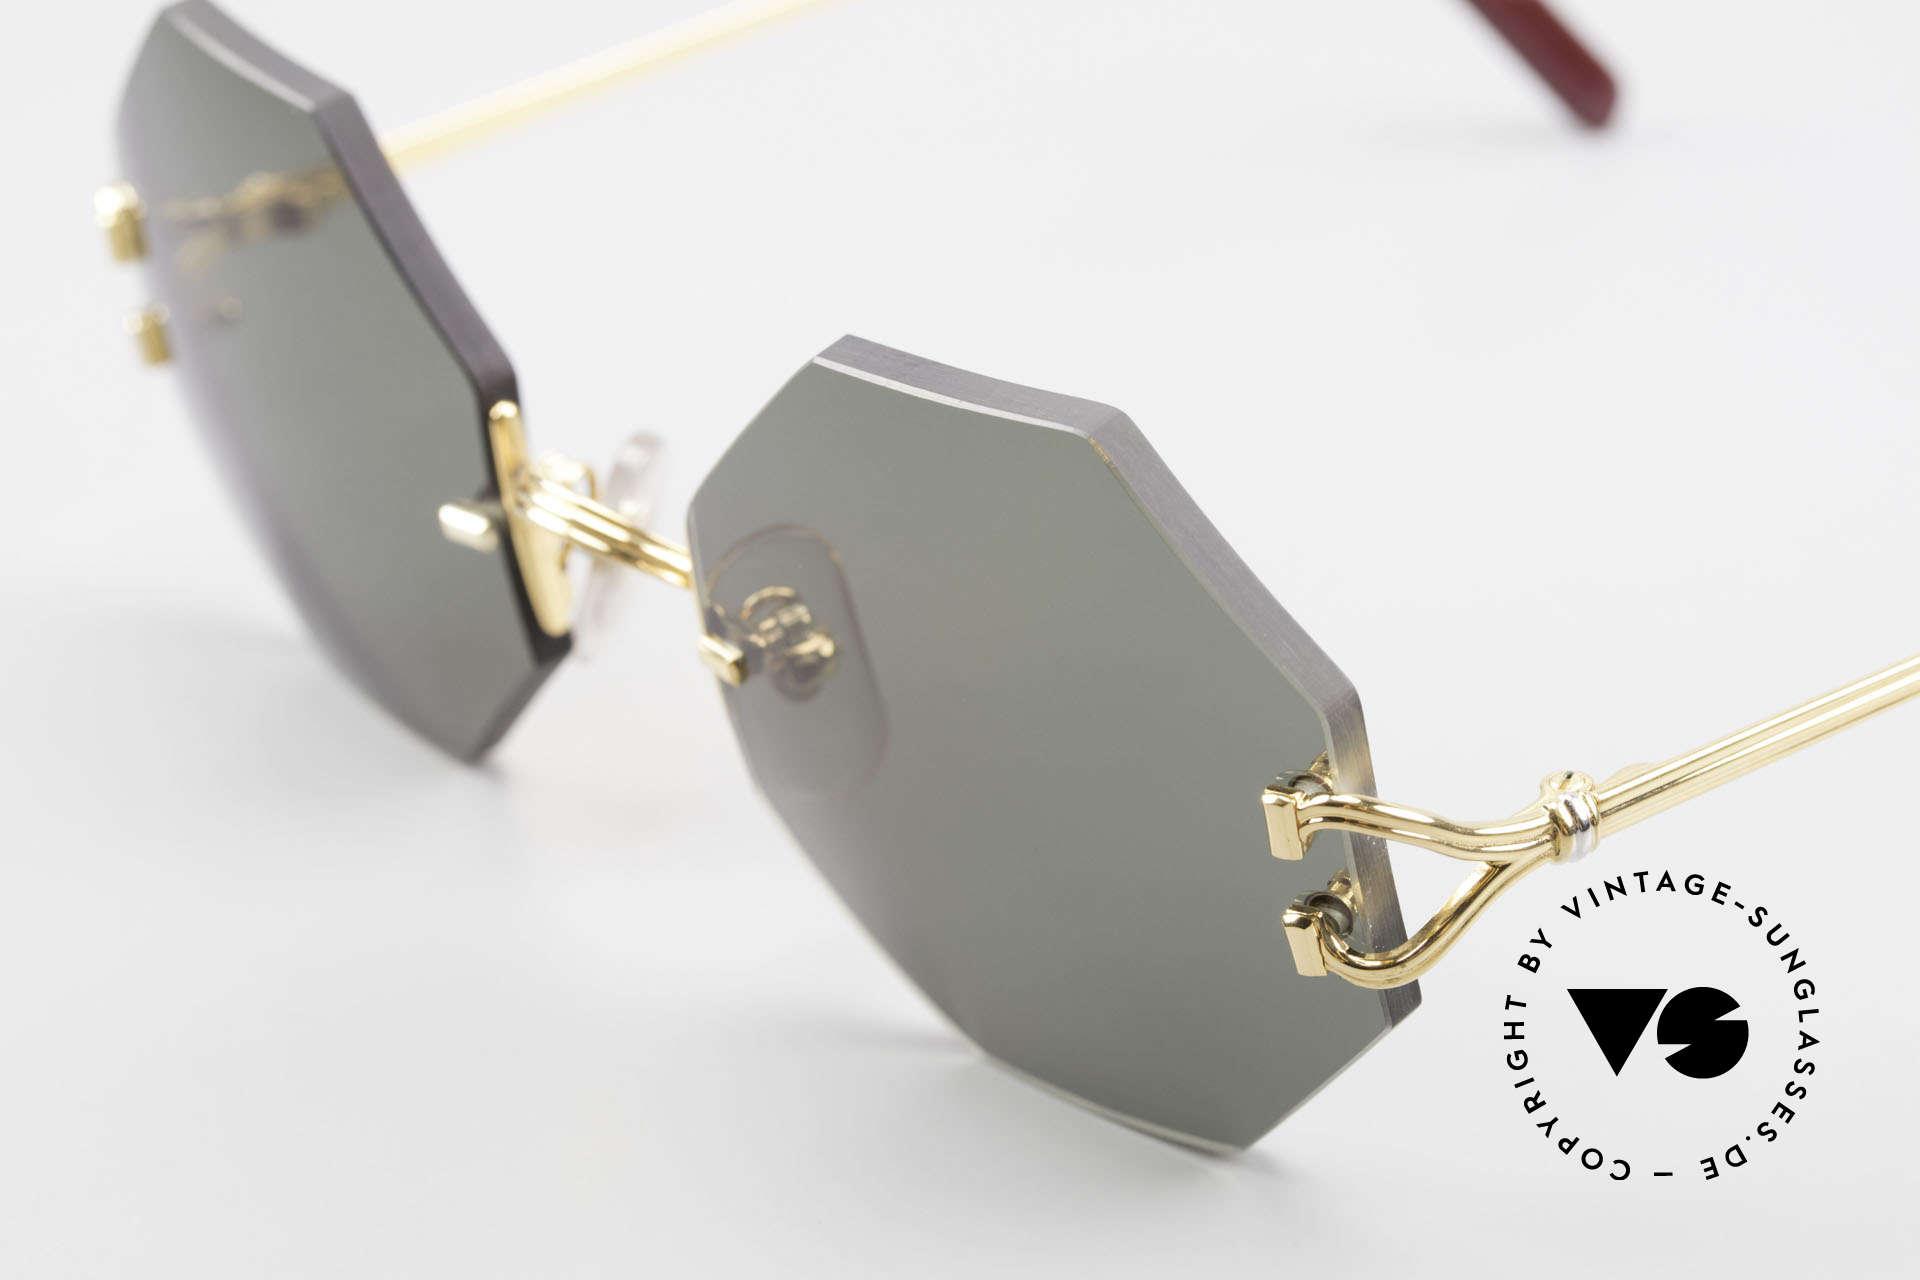 Cartier Rimless Octag Rimless Octagonal Sunglasses, precious OCTAG designer shades; 22kt GOLD-plated, Made for Men and Women